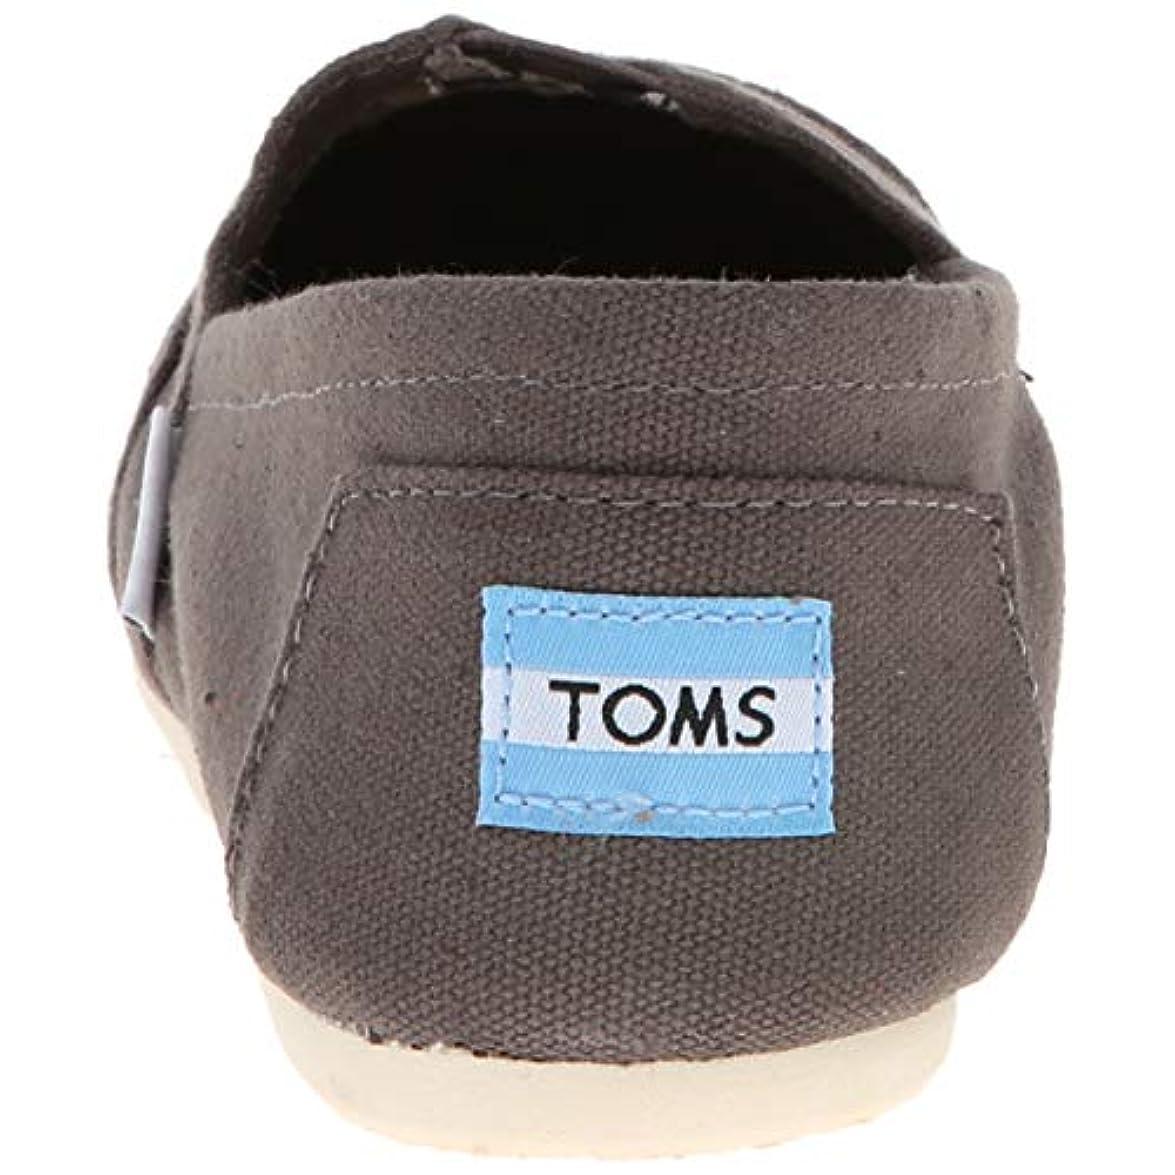 Toms Classic Glitter 1013b07 Baskets Modalità Donna